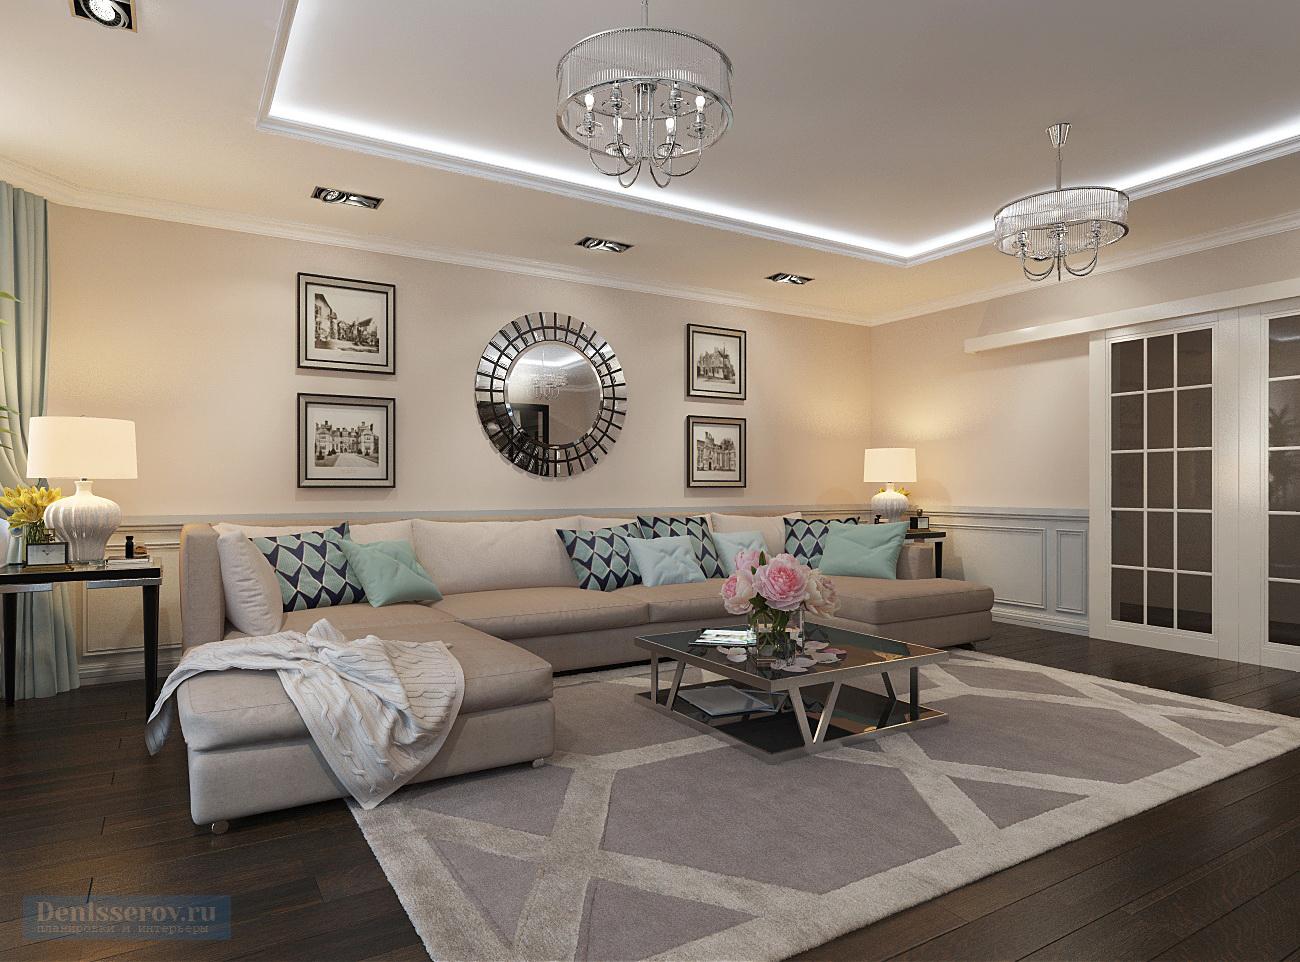 Дизайн квартир 40 квм в классическом стиле